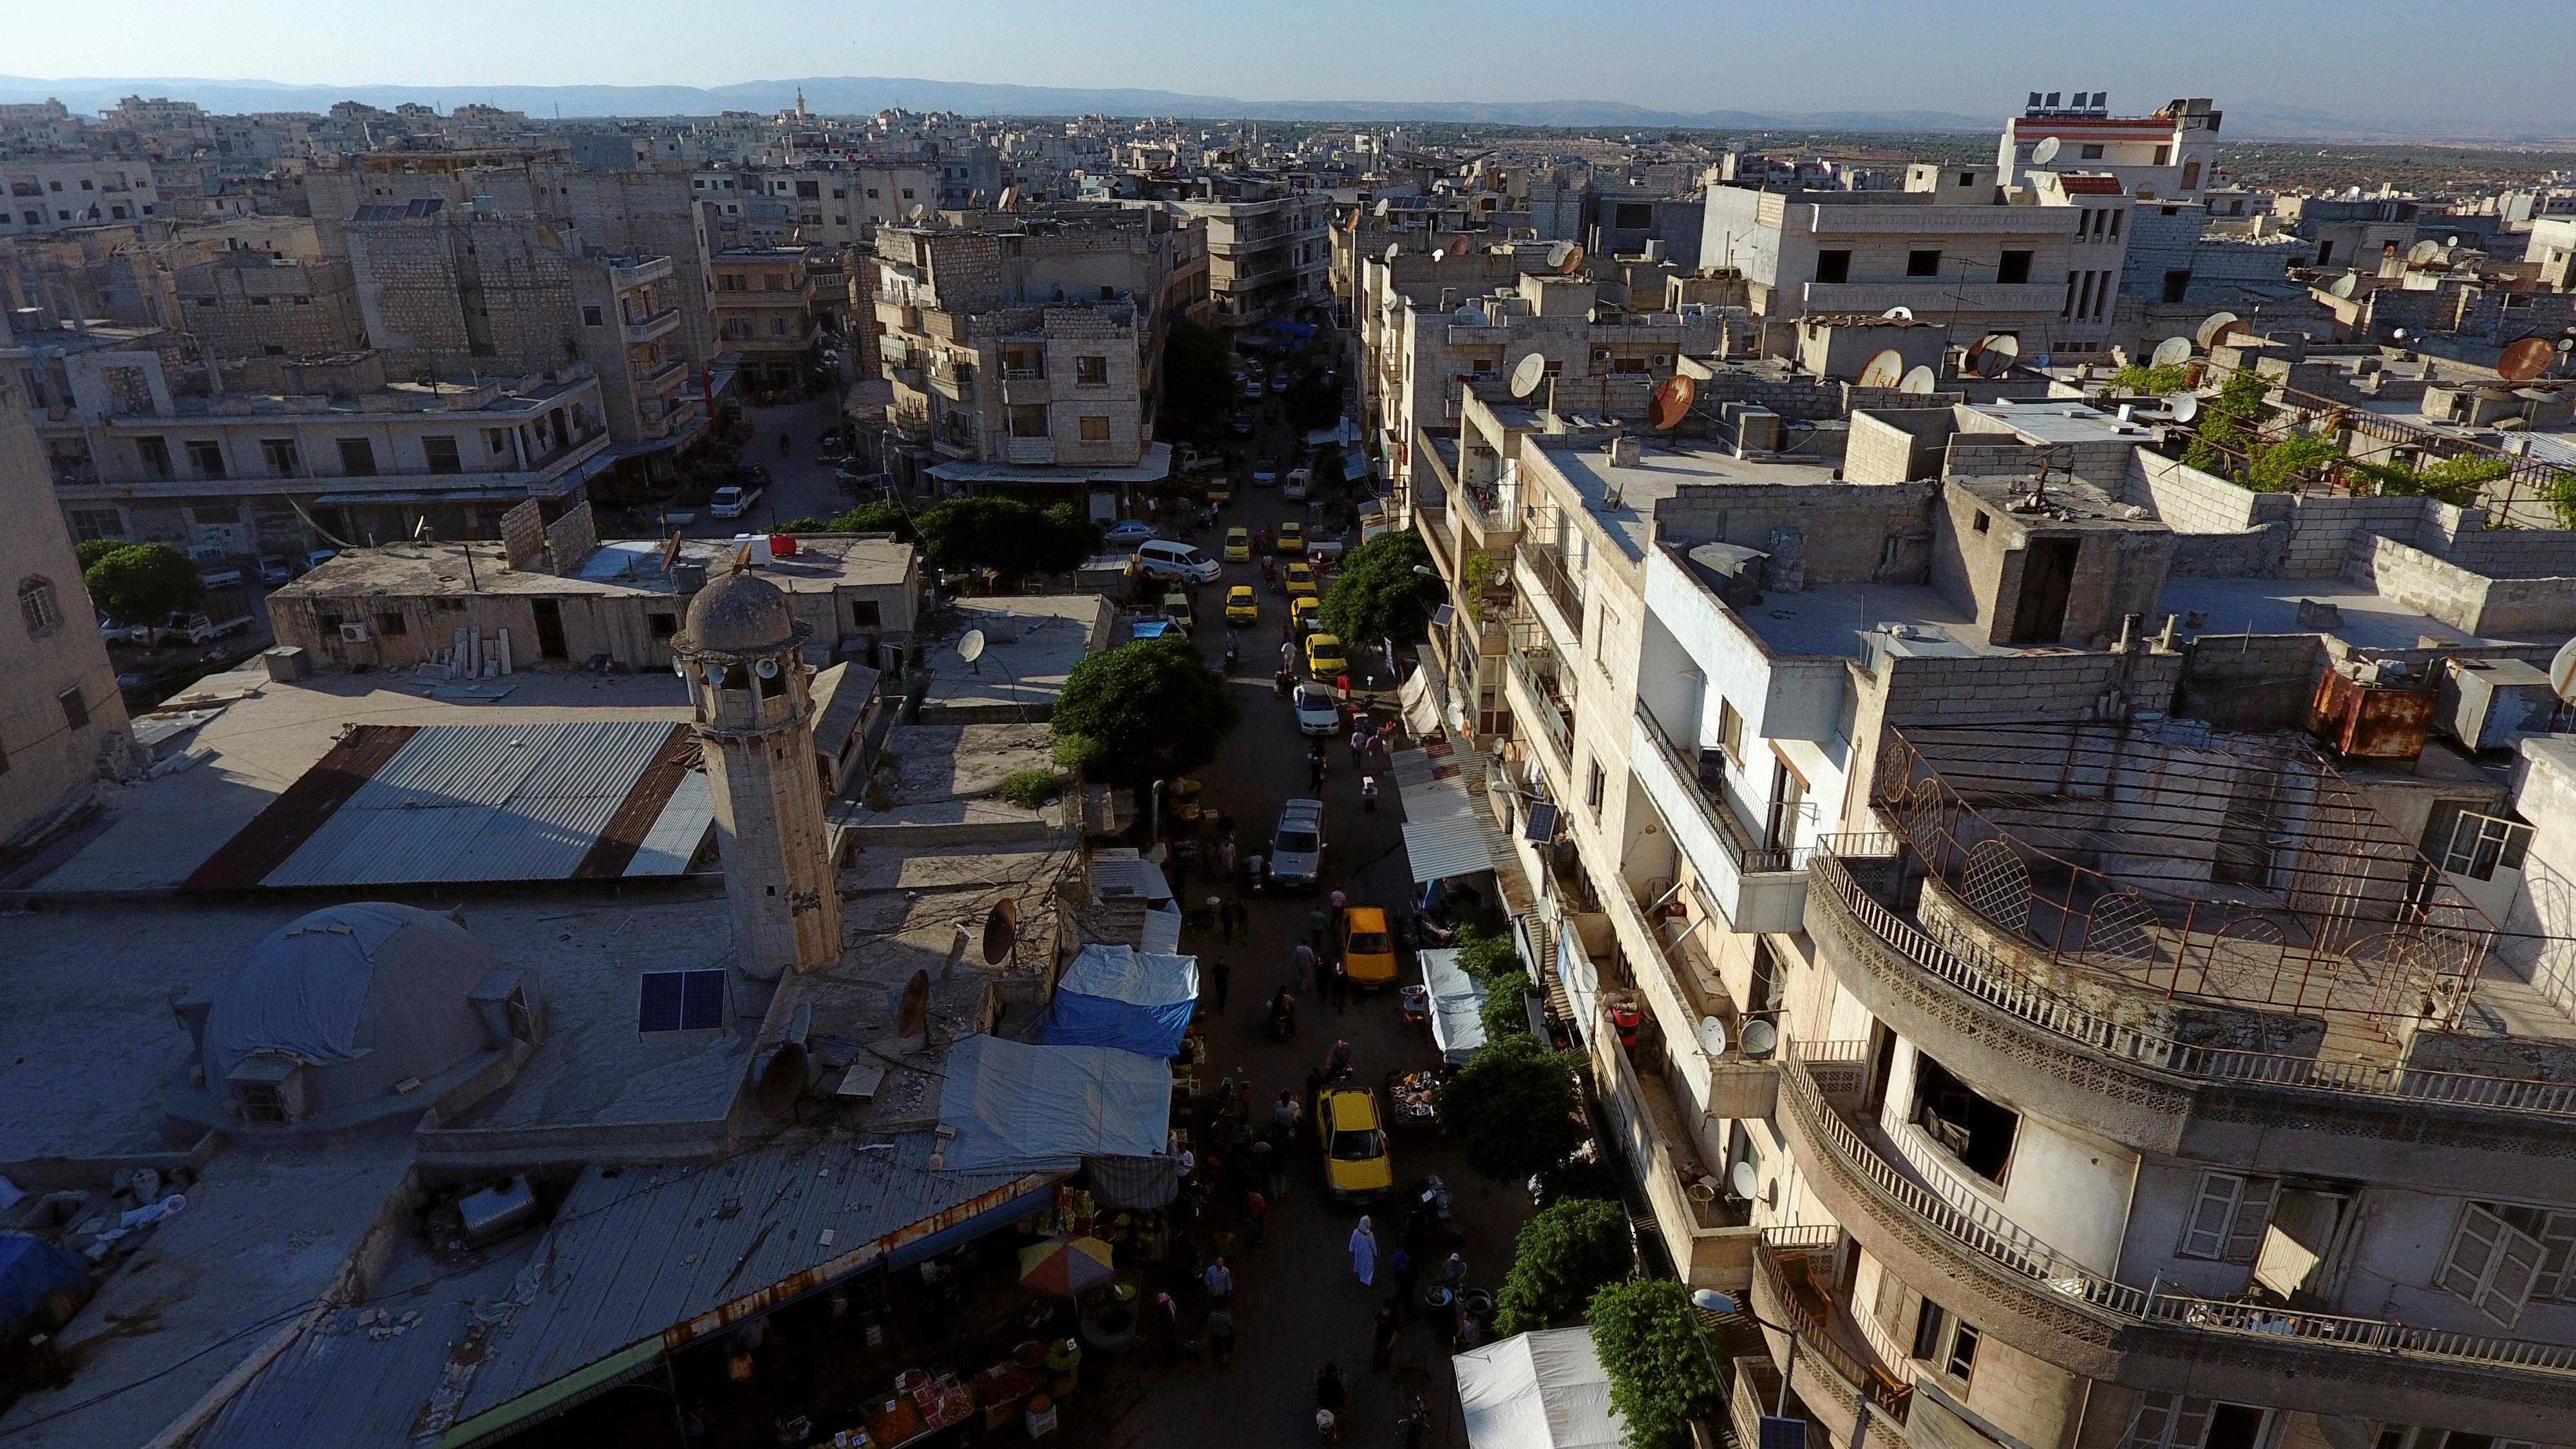 The rebel-held city of Idlib, Syria, seen on June 8, 2017.